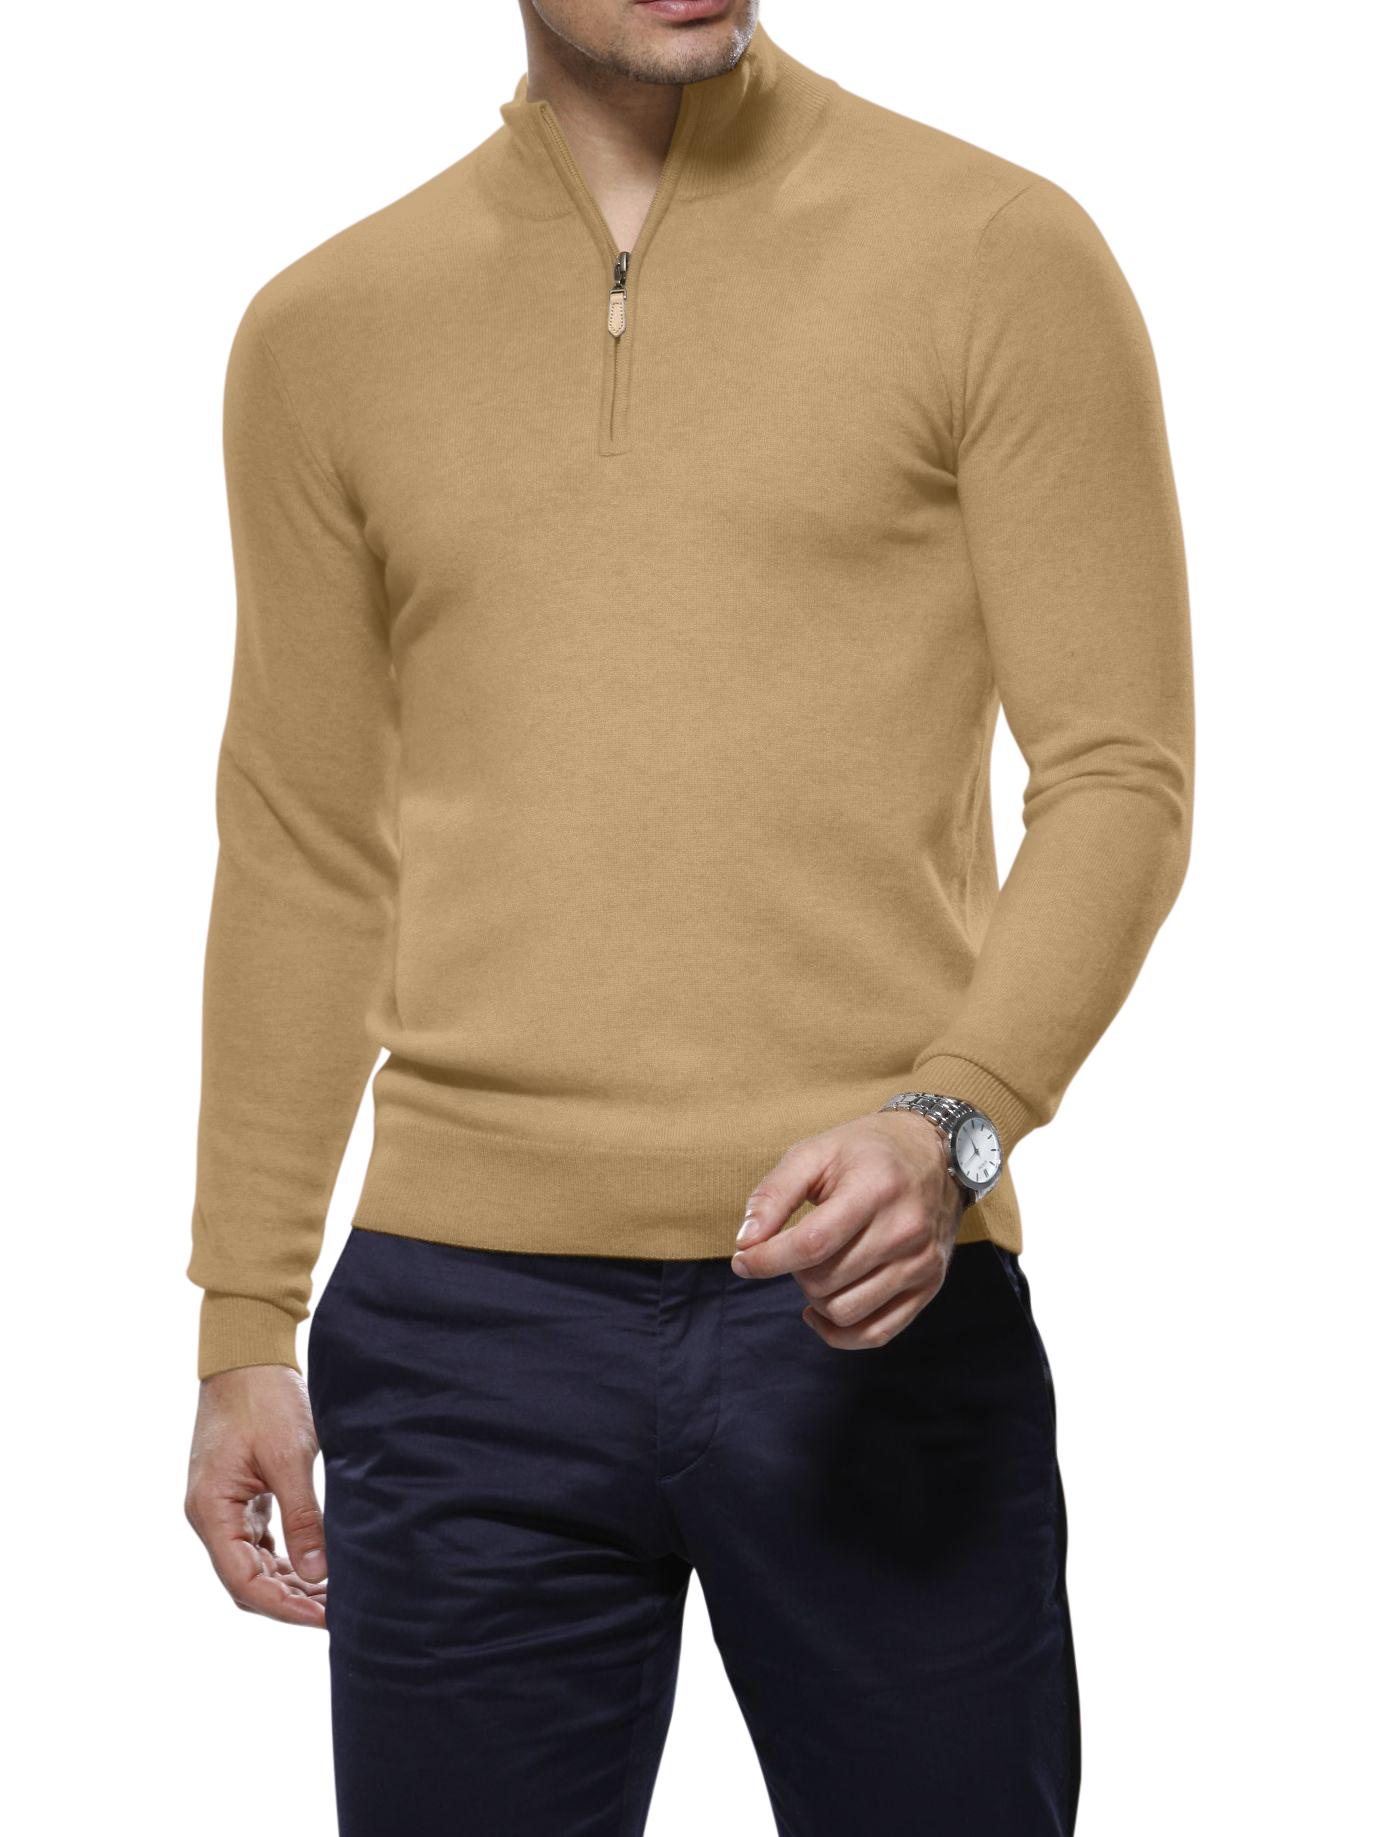 Light Camel Merino Wool 1/4 Zip Mock Sweater